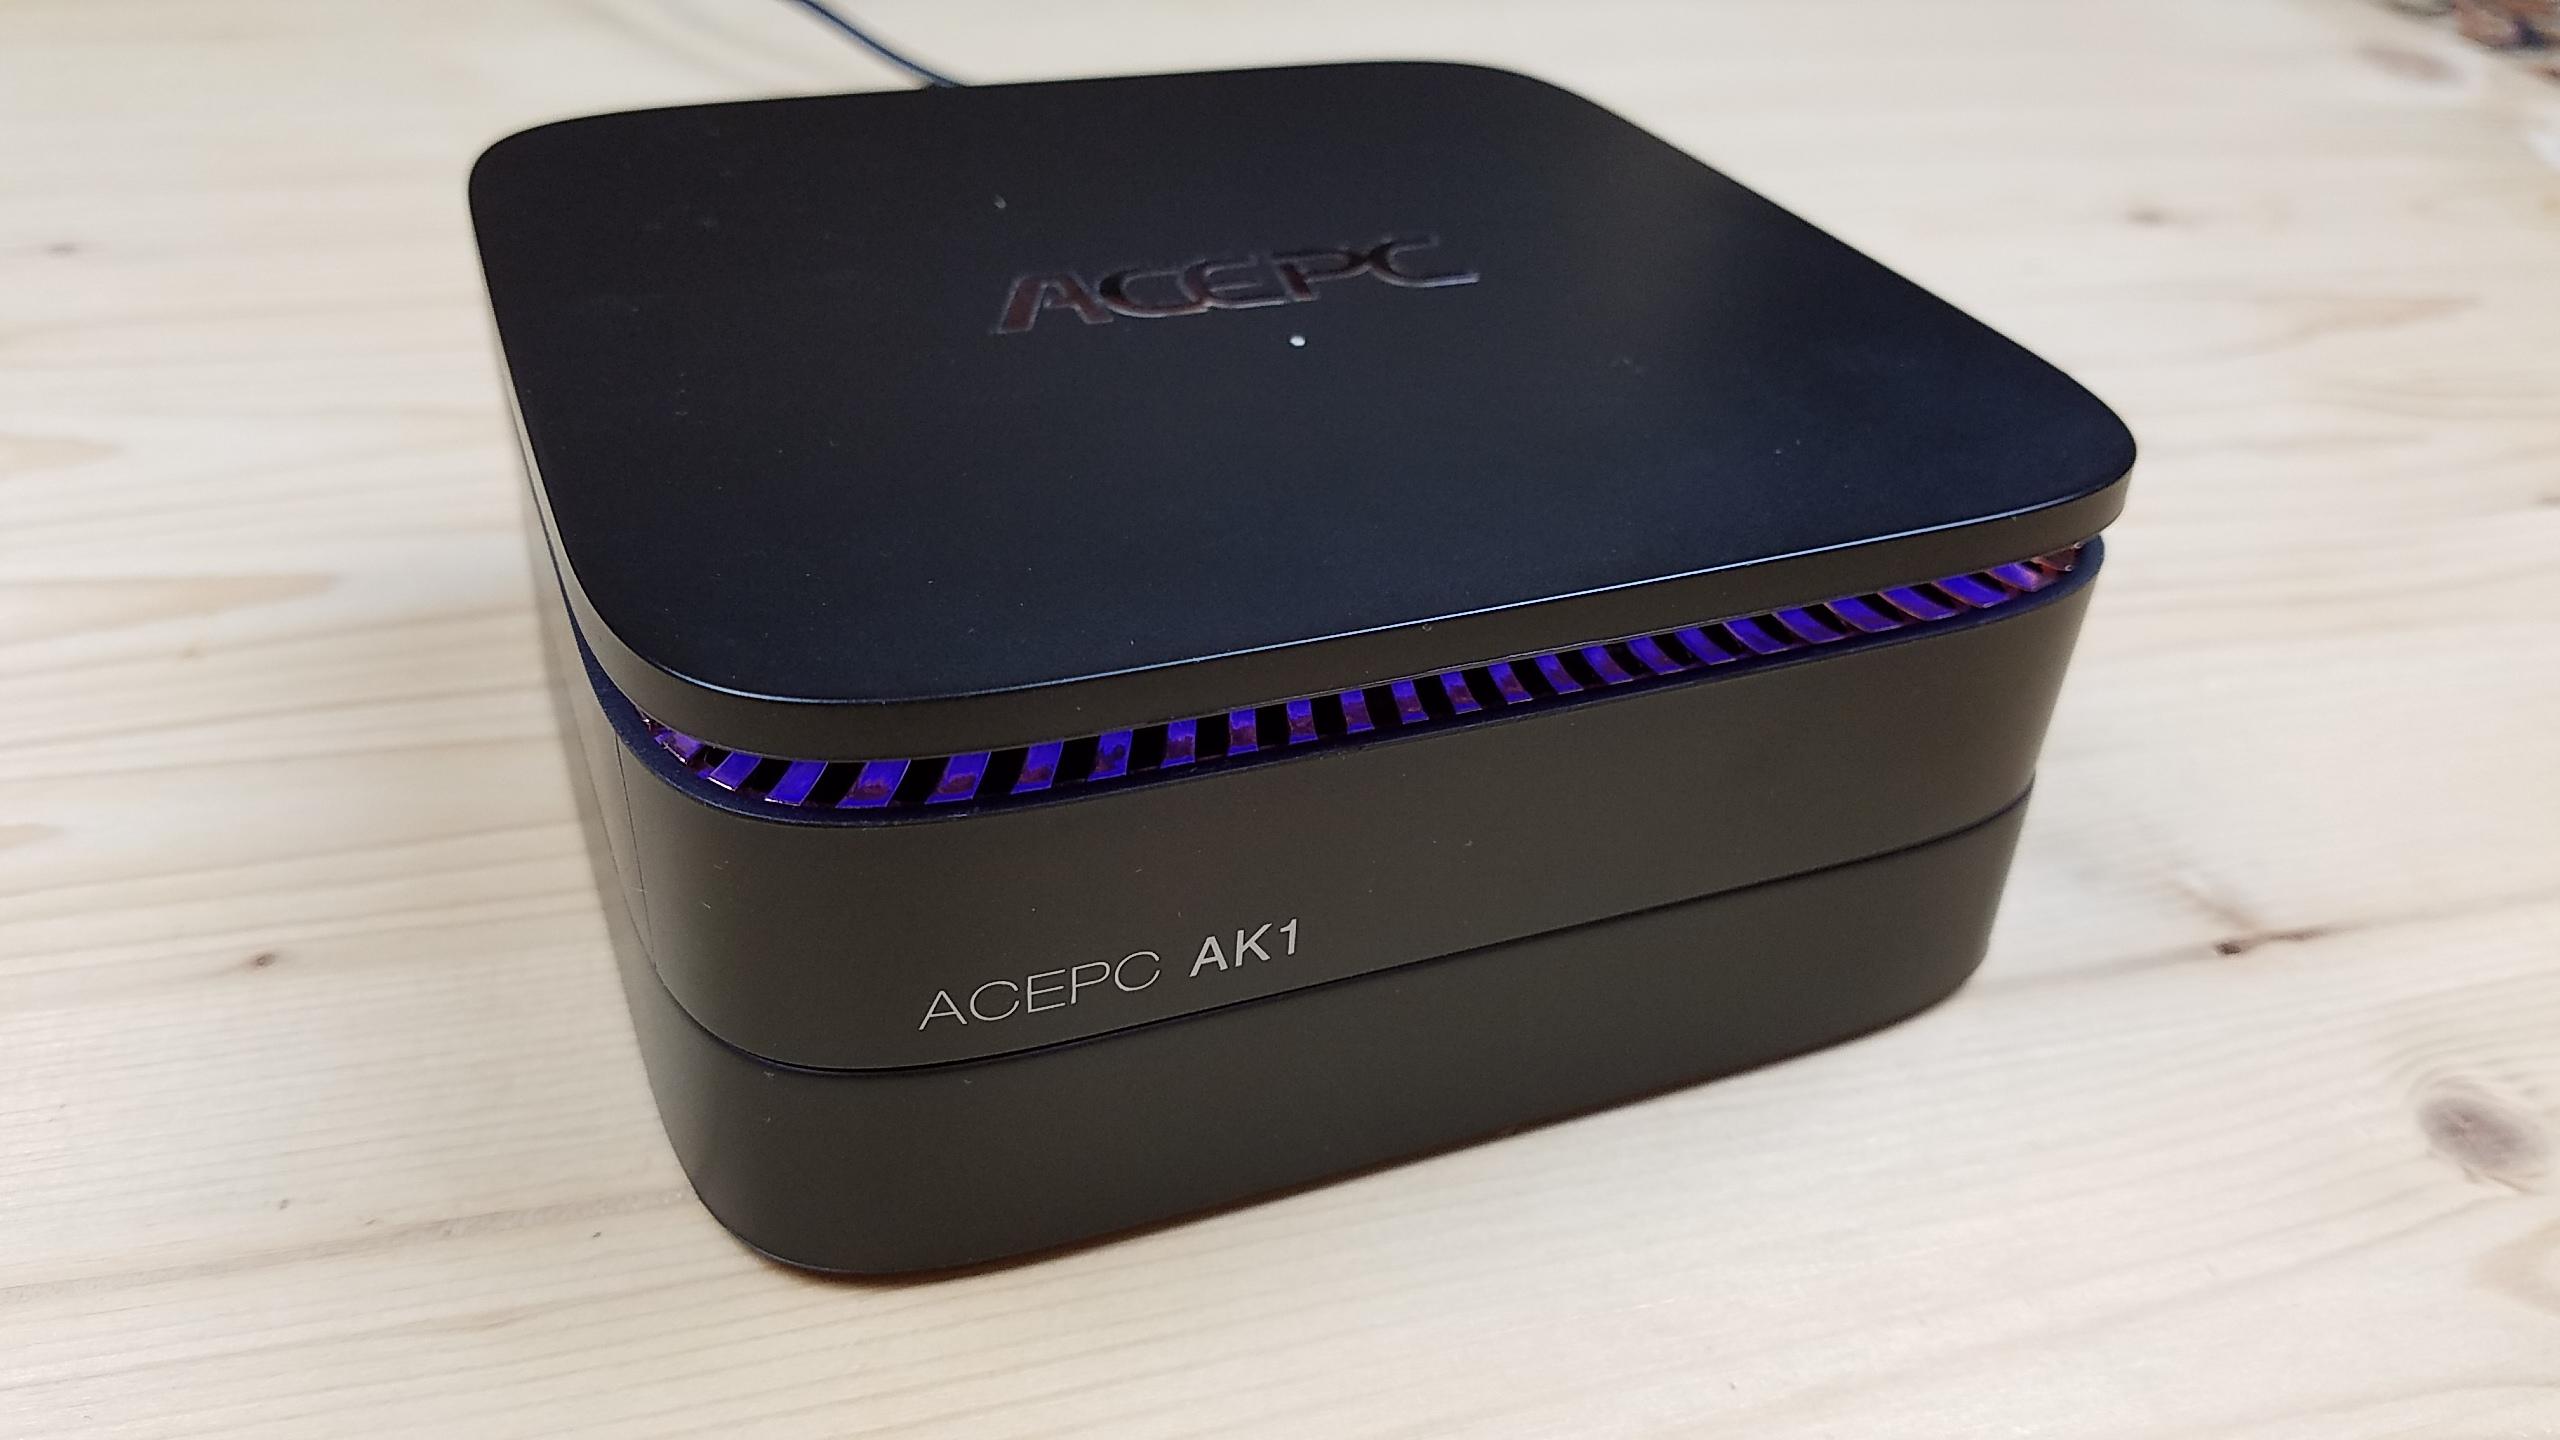 ACEPC AK1 - обзор отличного Мини ПК на Intel Celeron J3455 с